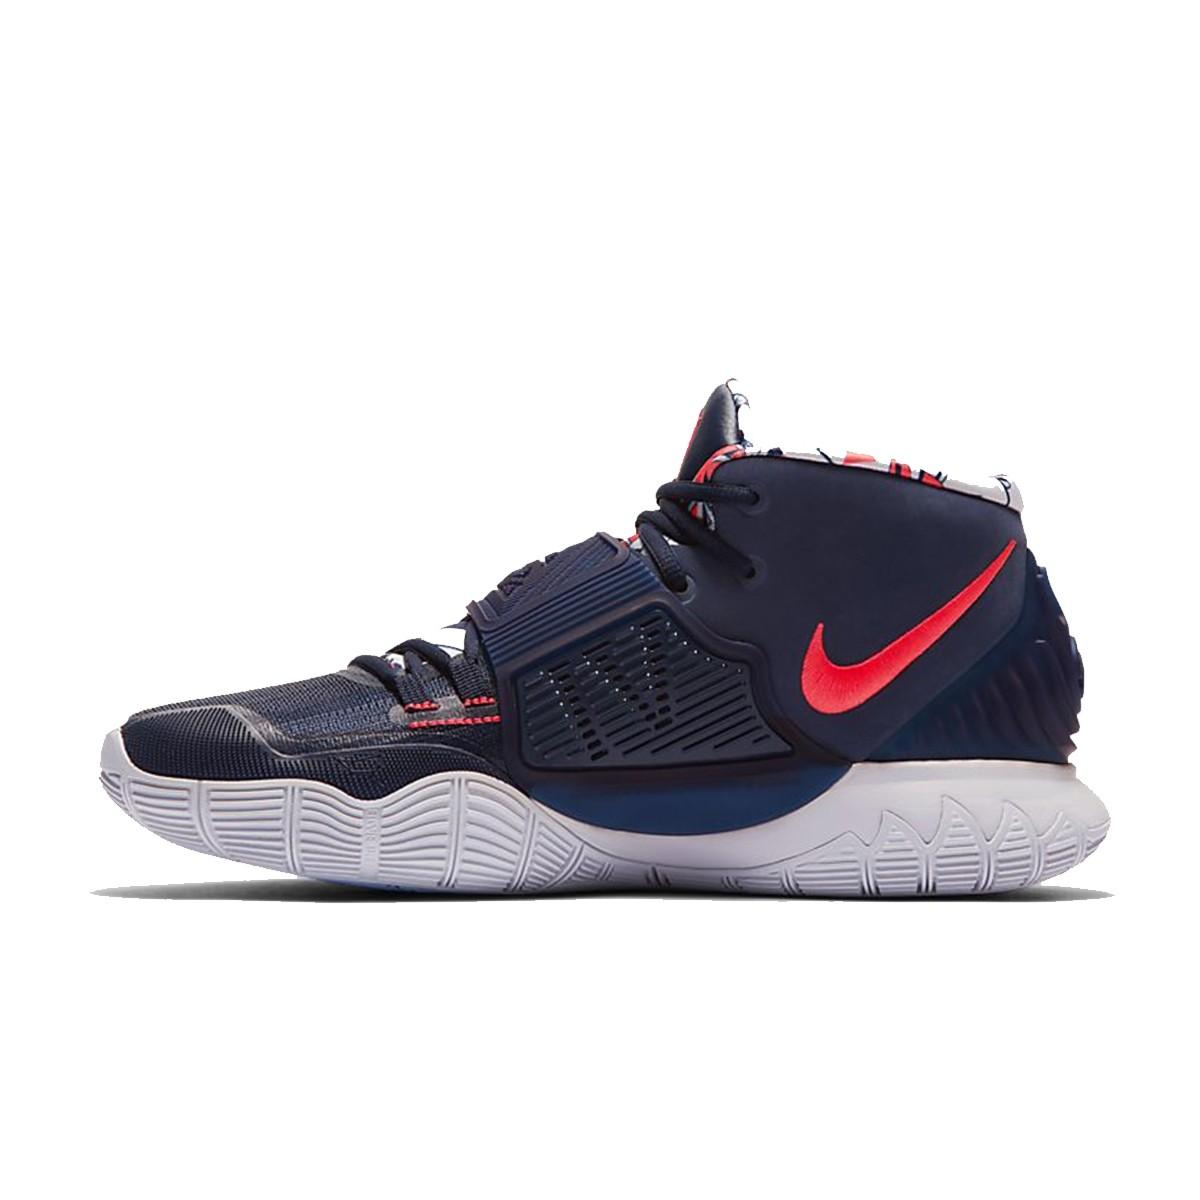 Nike Kyrie 6 'USA'-BQ4630-402